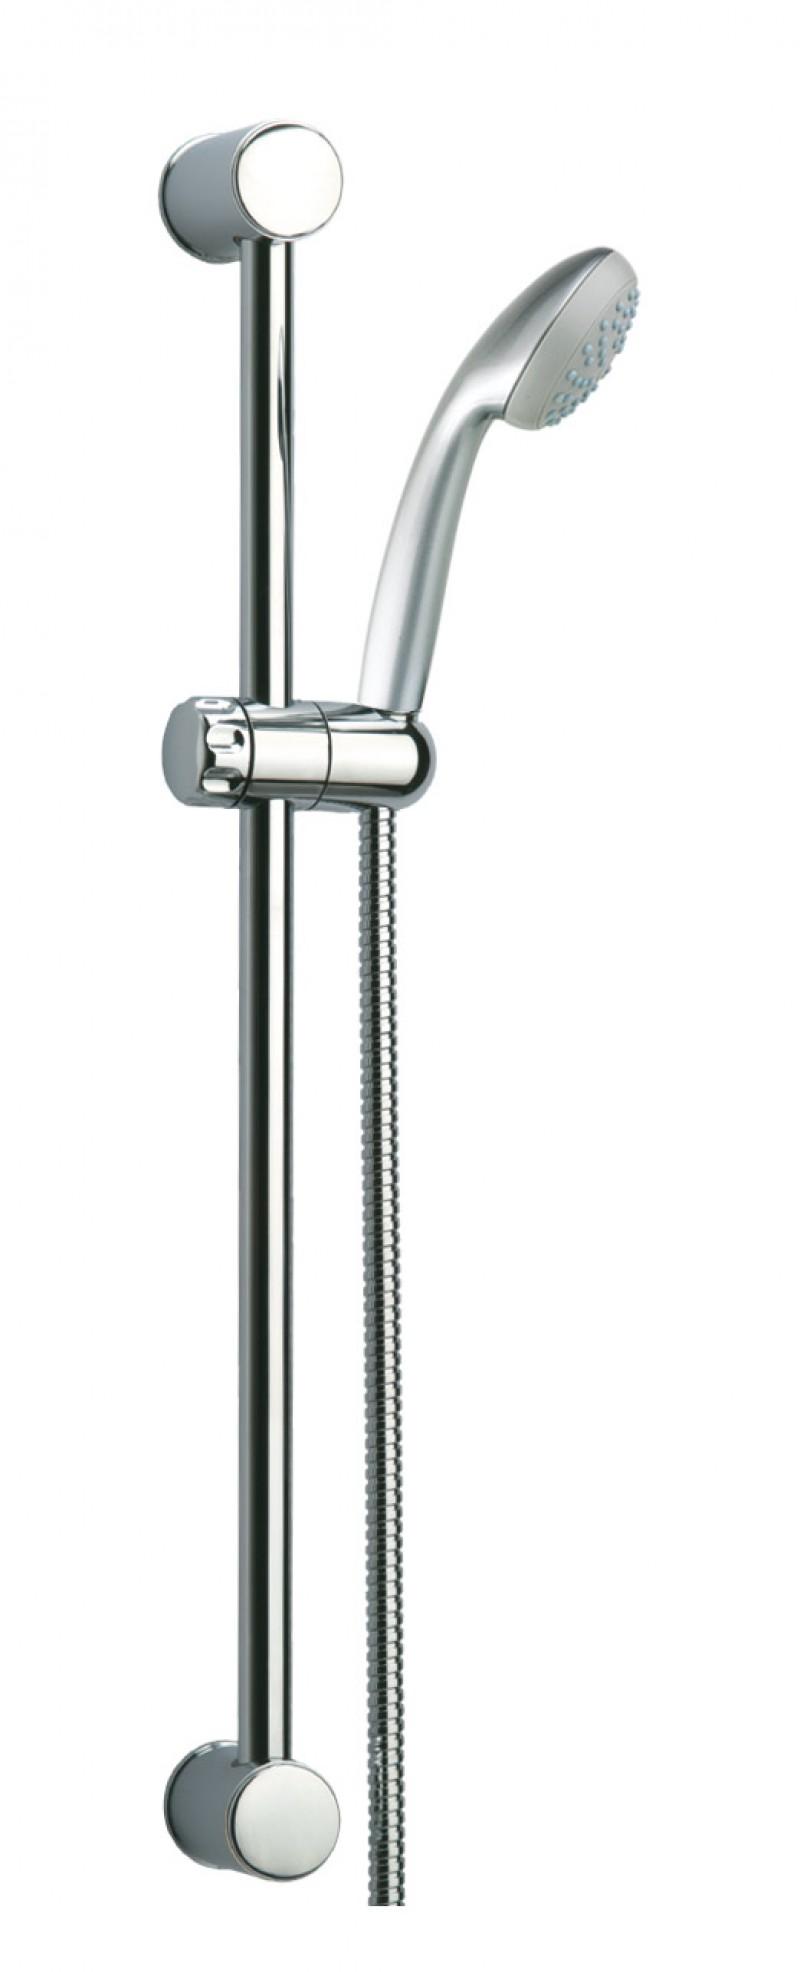 Barra ducha cromo grohe relexa 60cms for Duchas grohe precios